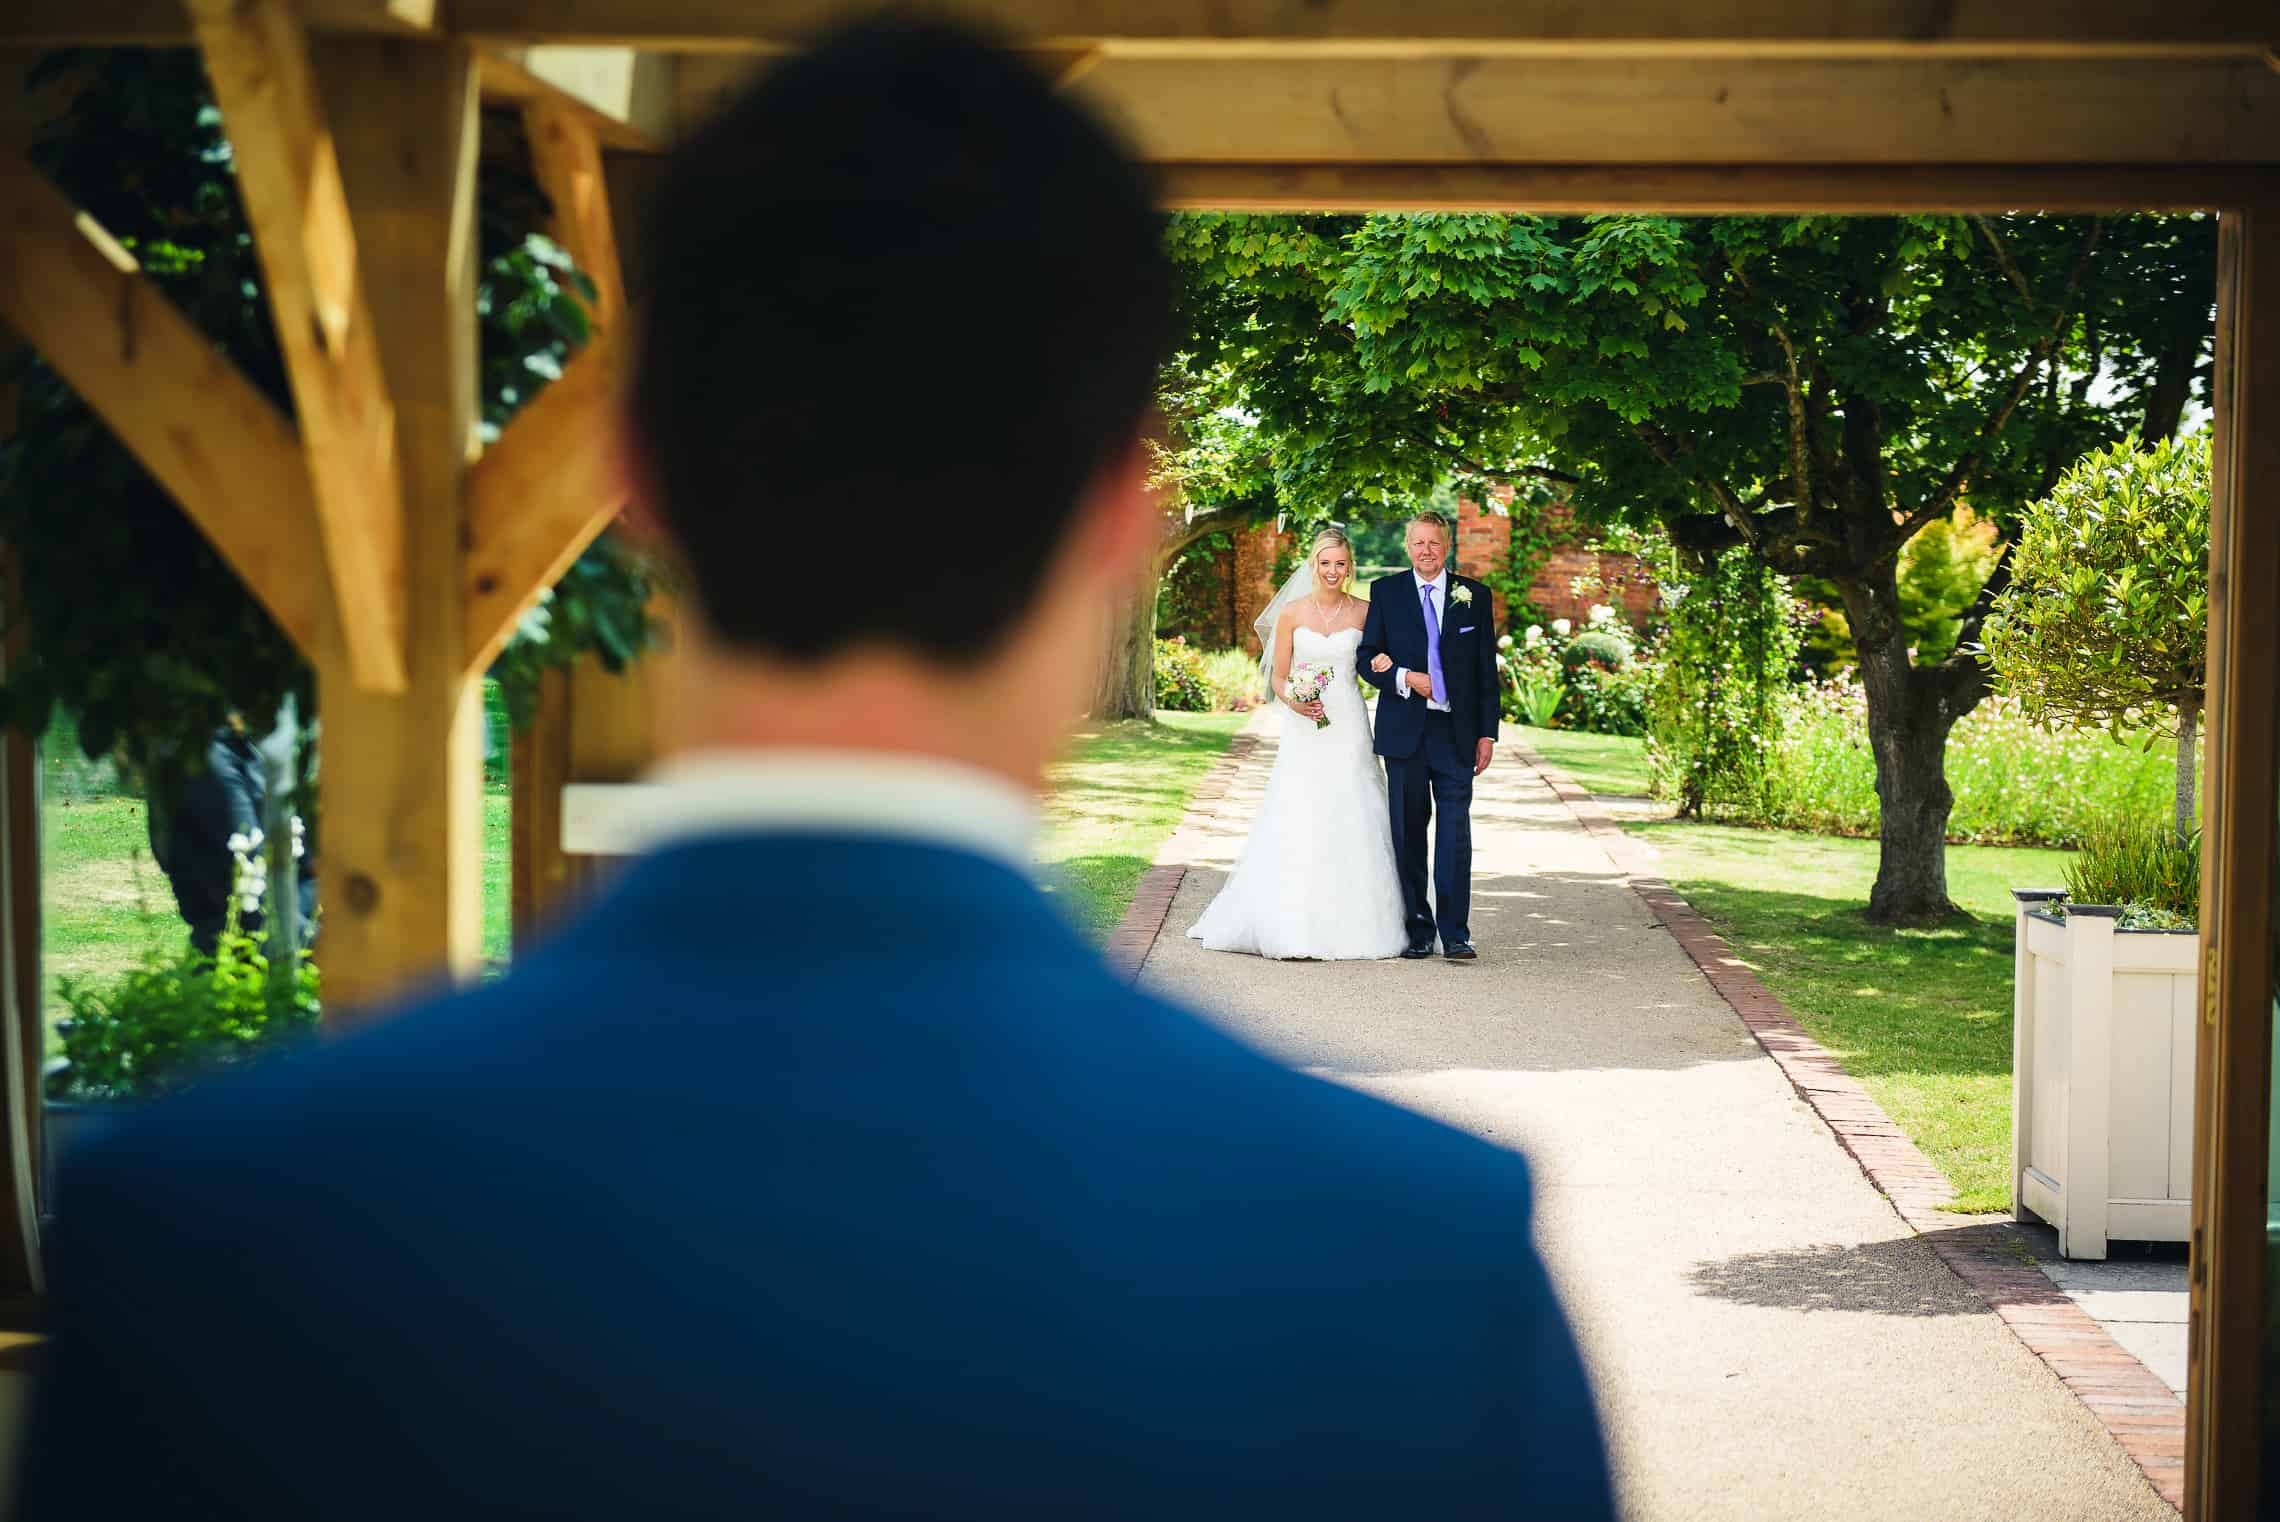 gaynes_park_wedding_lm_justin_bailey_photography_005